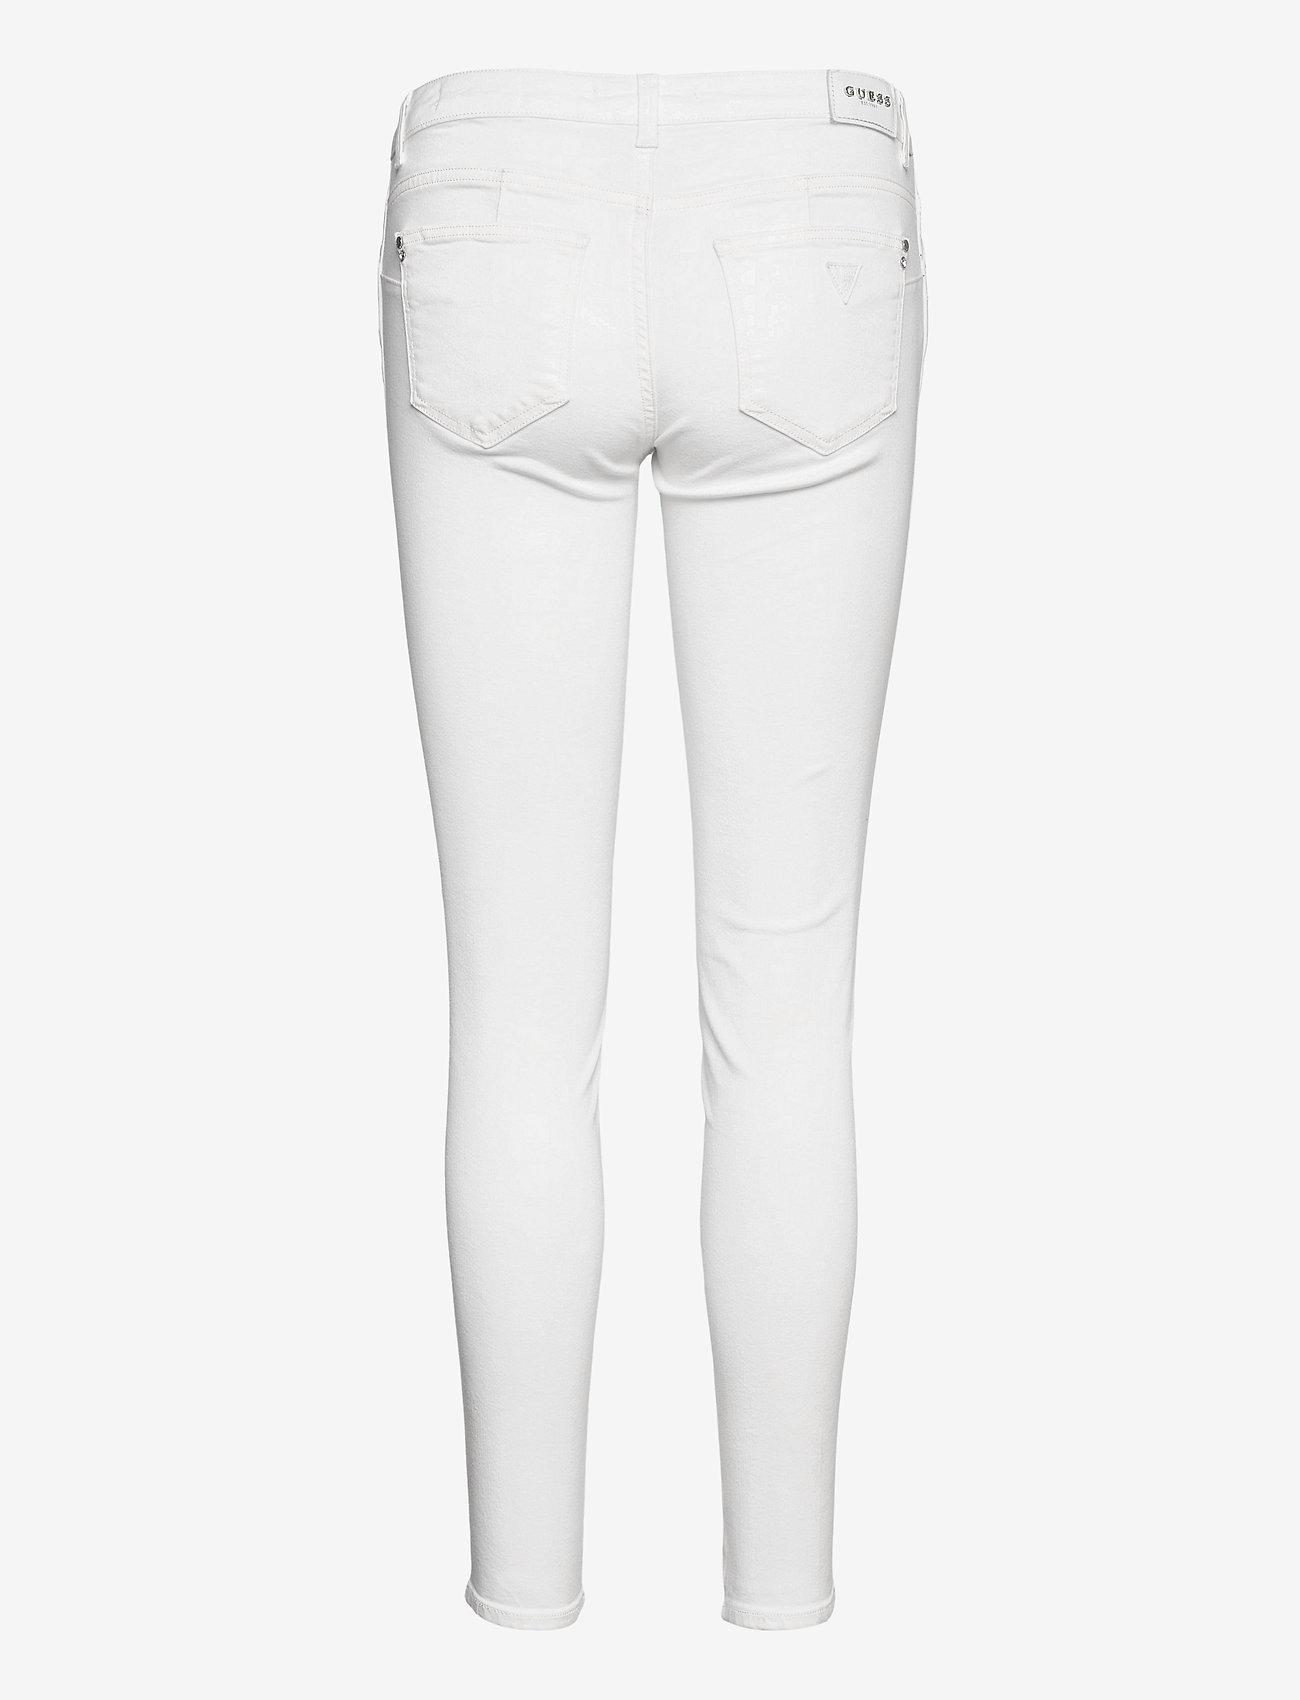 GUESS Jeans - CURVE X - jeans slim - paper moon - 1